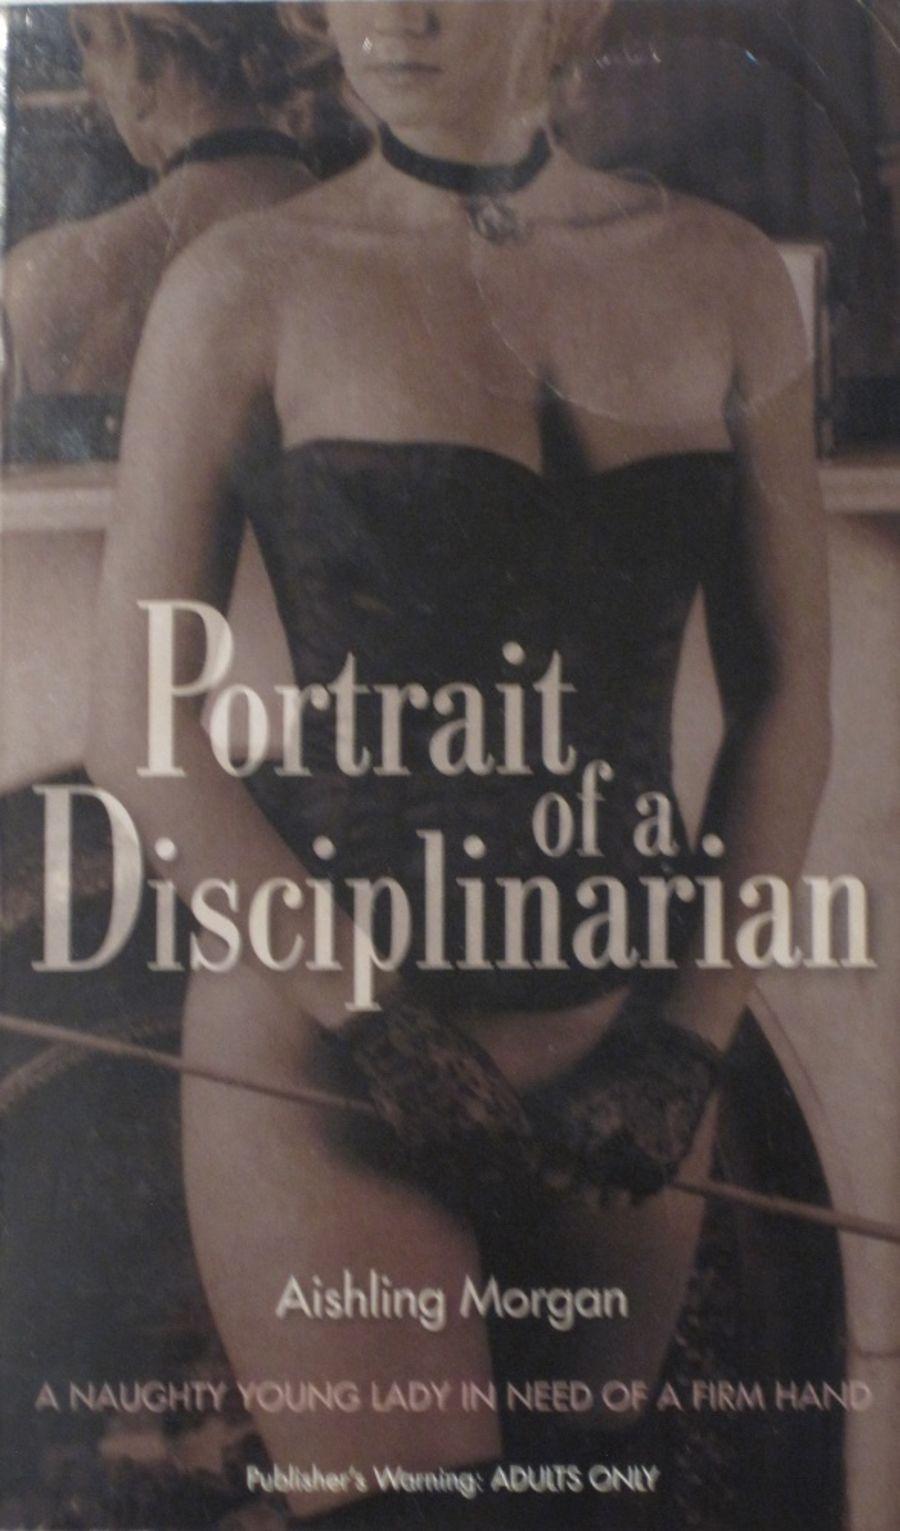 PORTRAIT OF A DISCIPLINARIAN.  2008 EROTIC FICTION PAPERBACK BOOK.